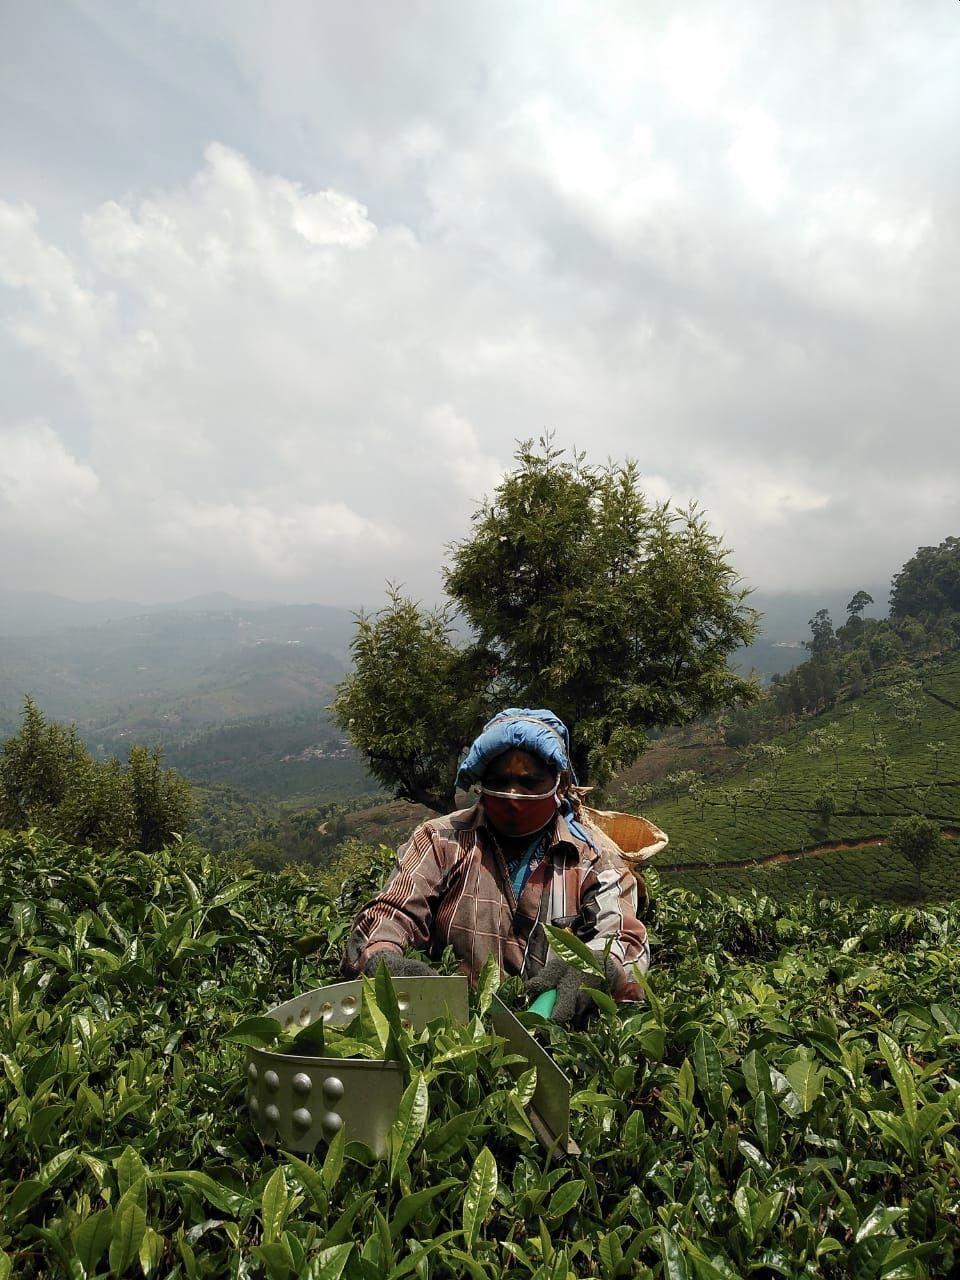 Picking tea in the Nilgiris region of India and following coronavirus guidelines.